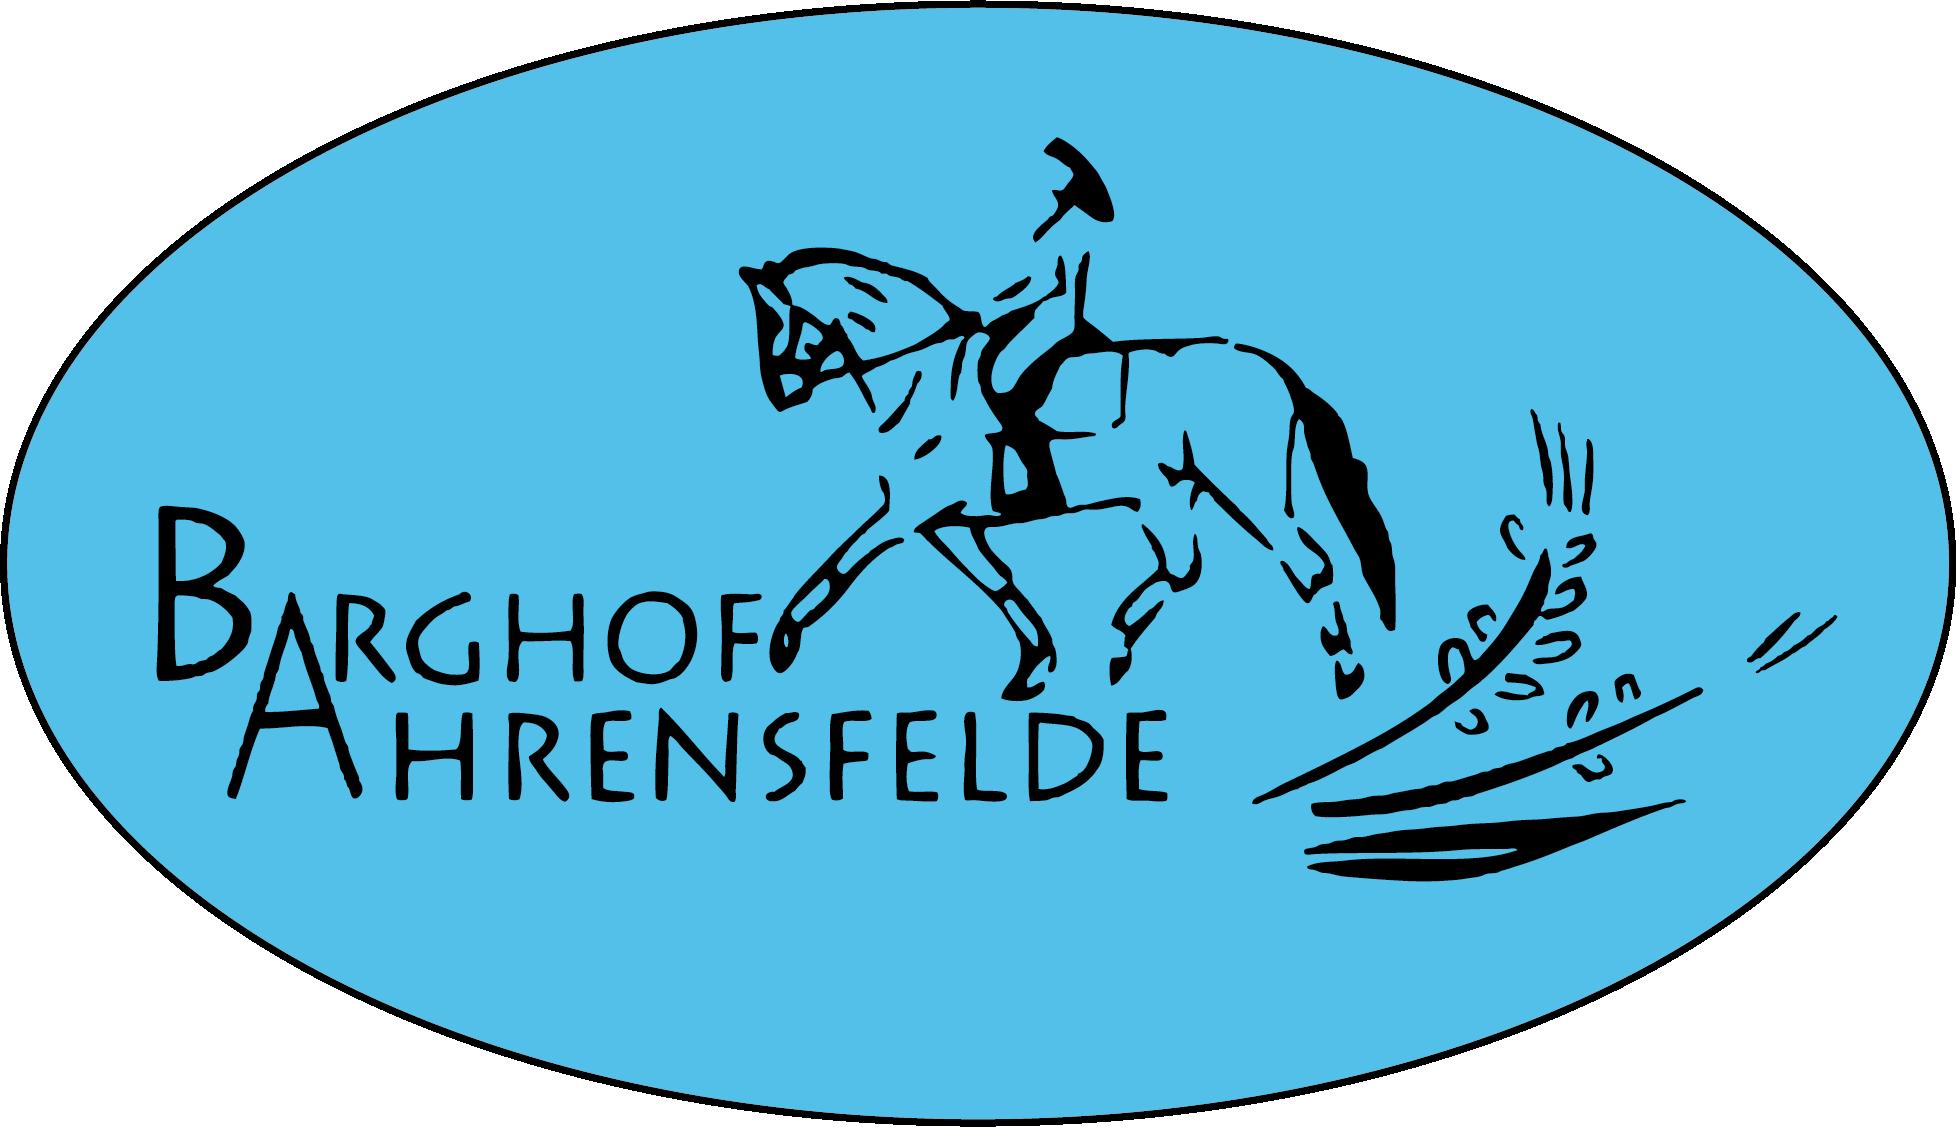 Barghof Ahrensfelde